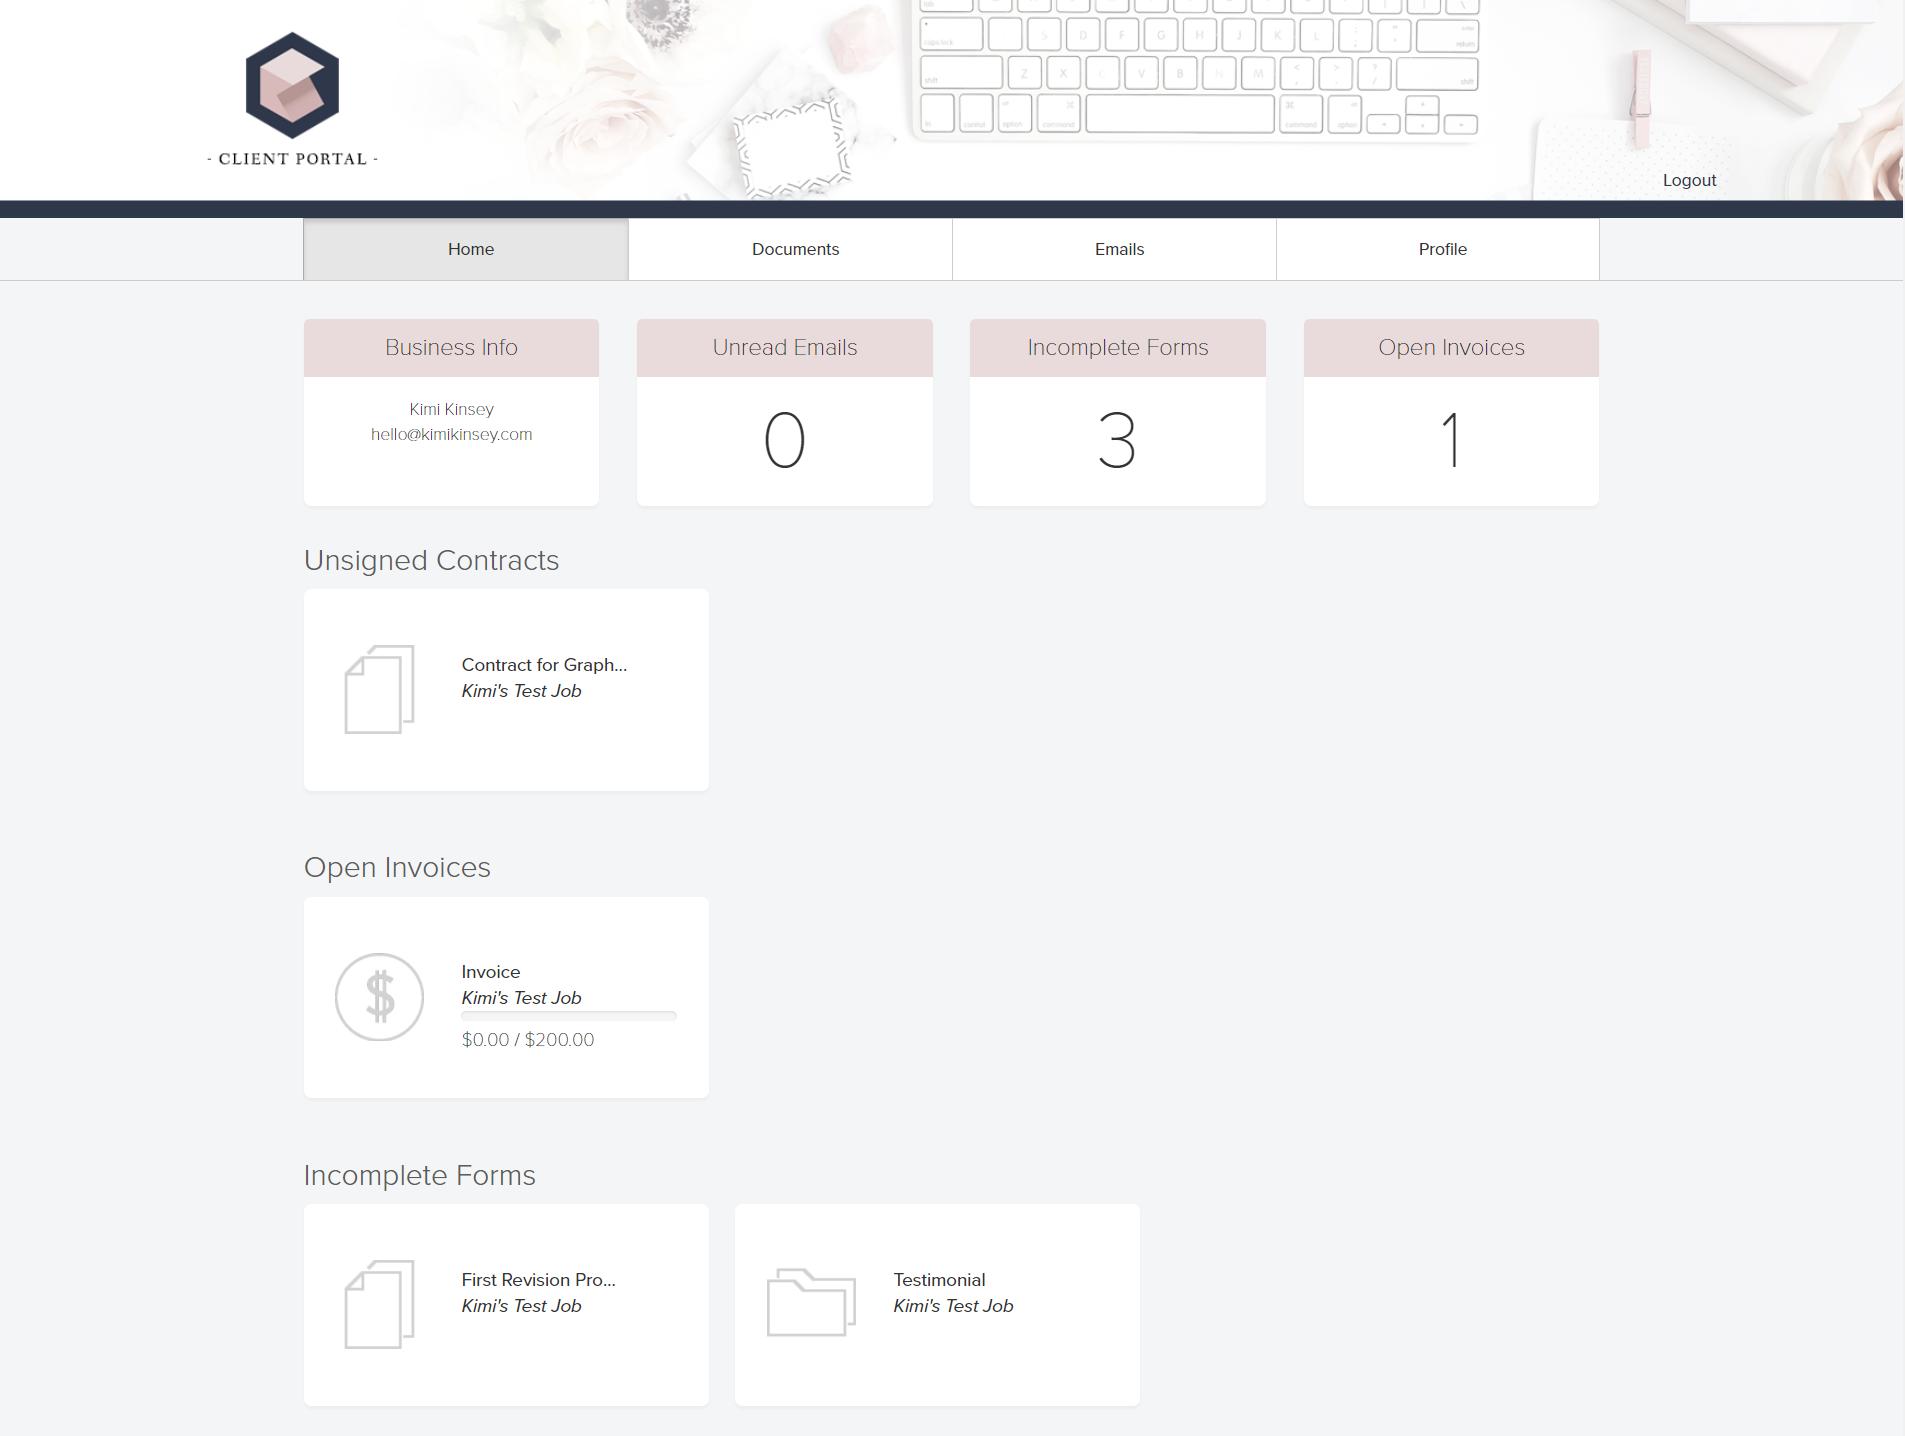 Dubsado Client Portal Example